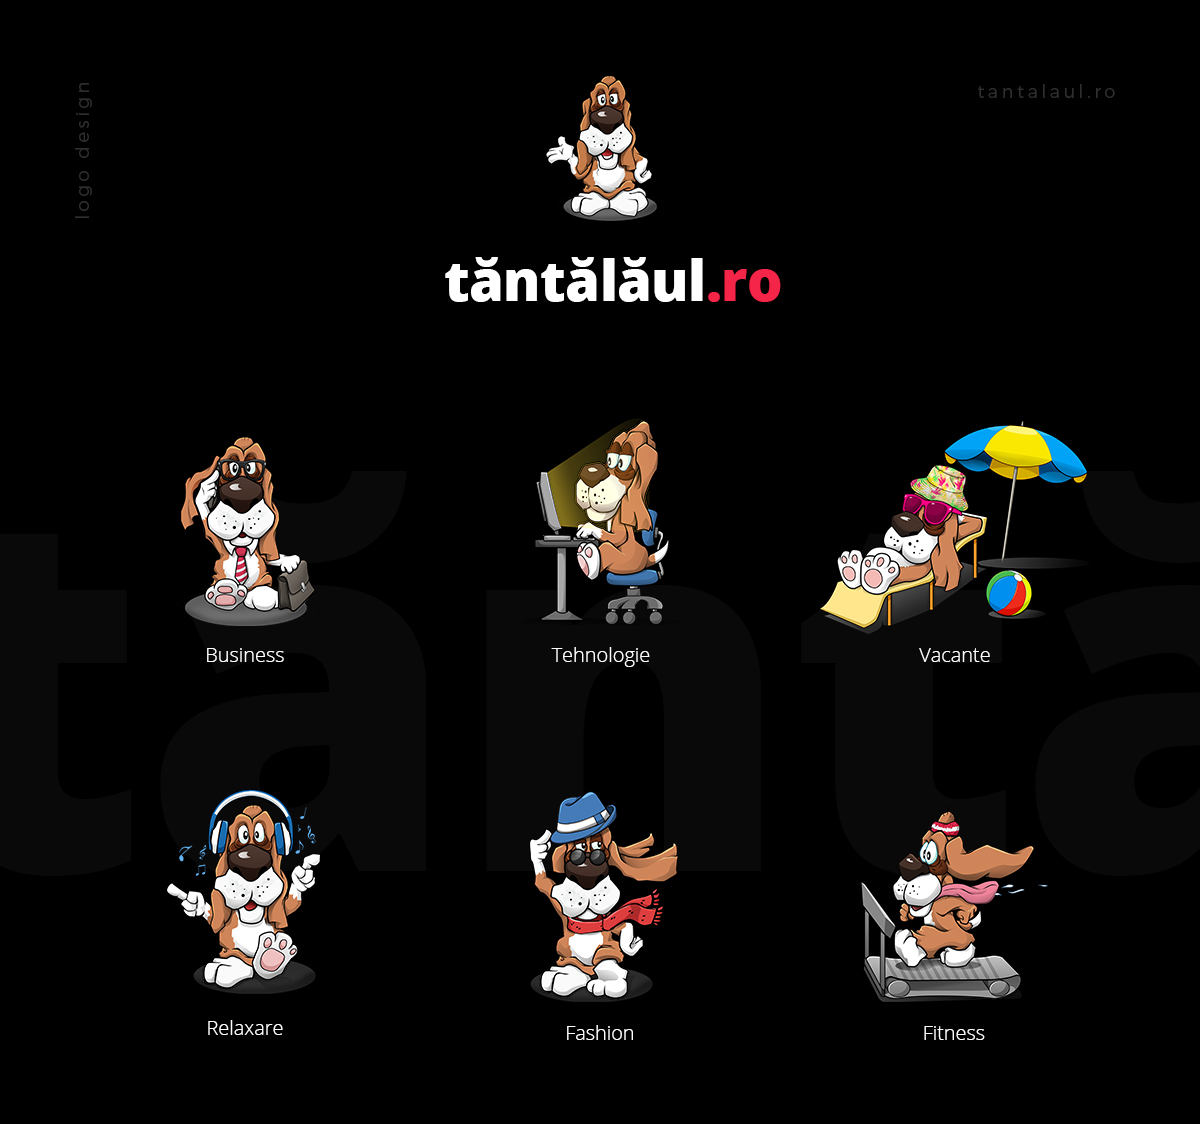 tantalaul logo design - Tantalaul